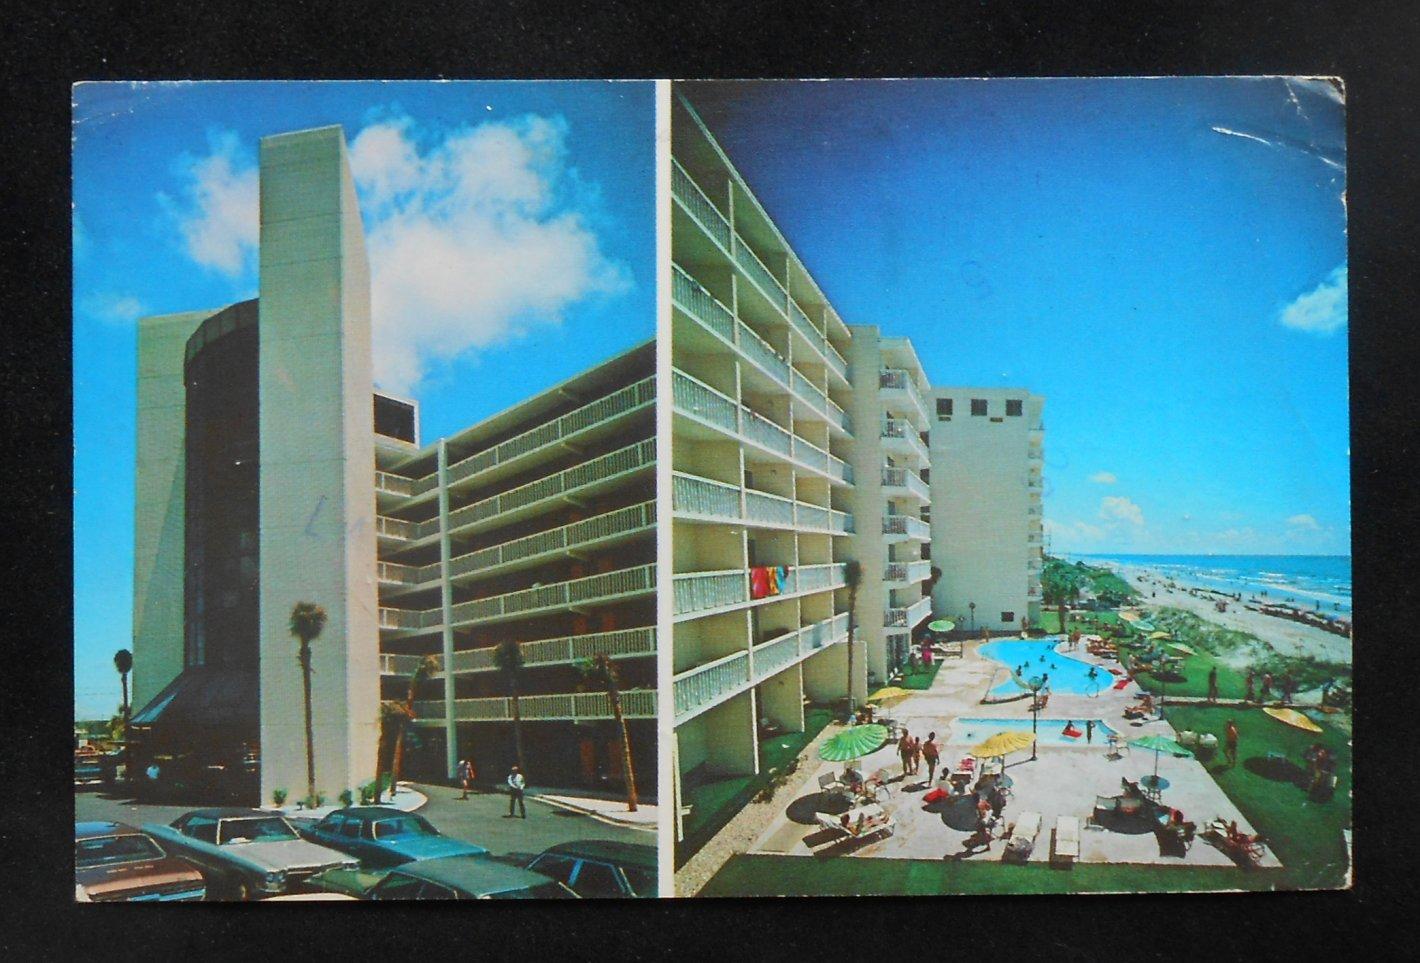 1974 Ocean Dunes Motor Inn 74th 75th Avenue North Myrtle